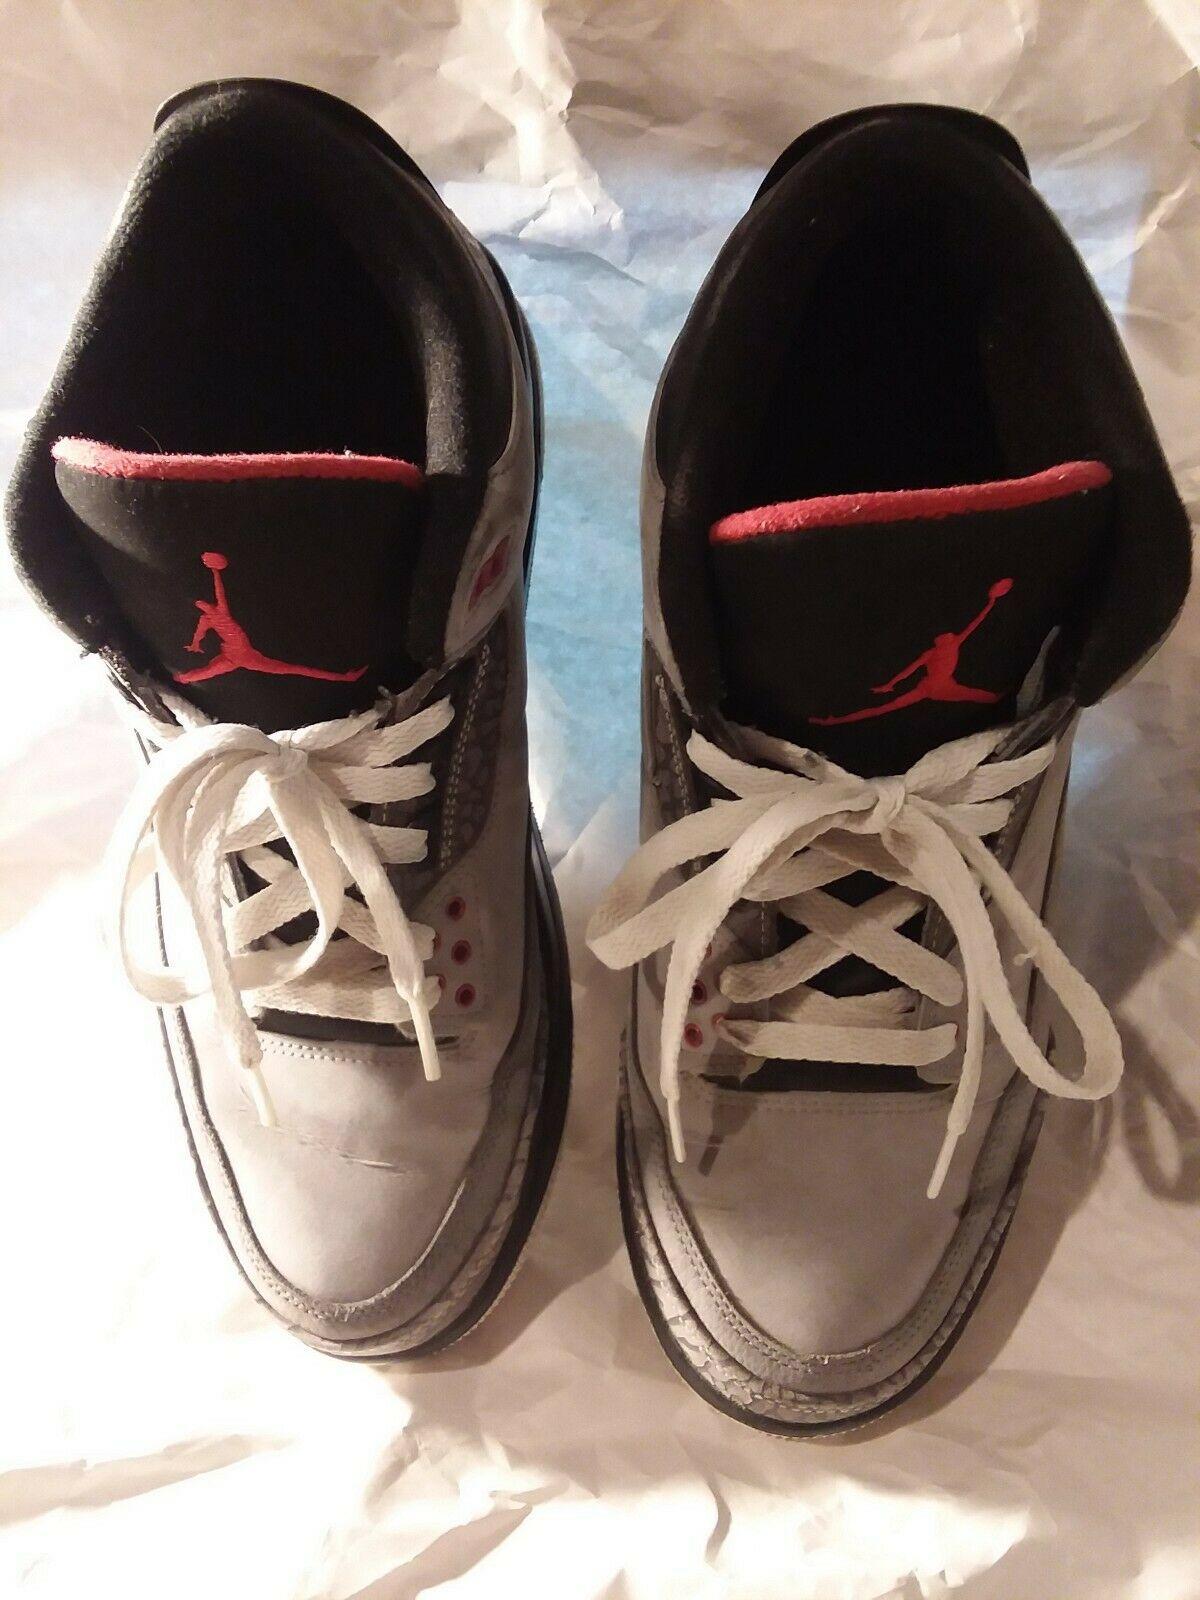 Nike Air Jordan Retro Retro Retro 3 Stealth ( 136064-003 ) -  Size 10.5. 9102c6